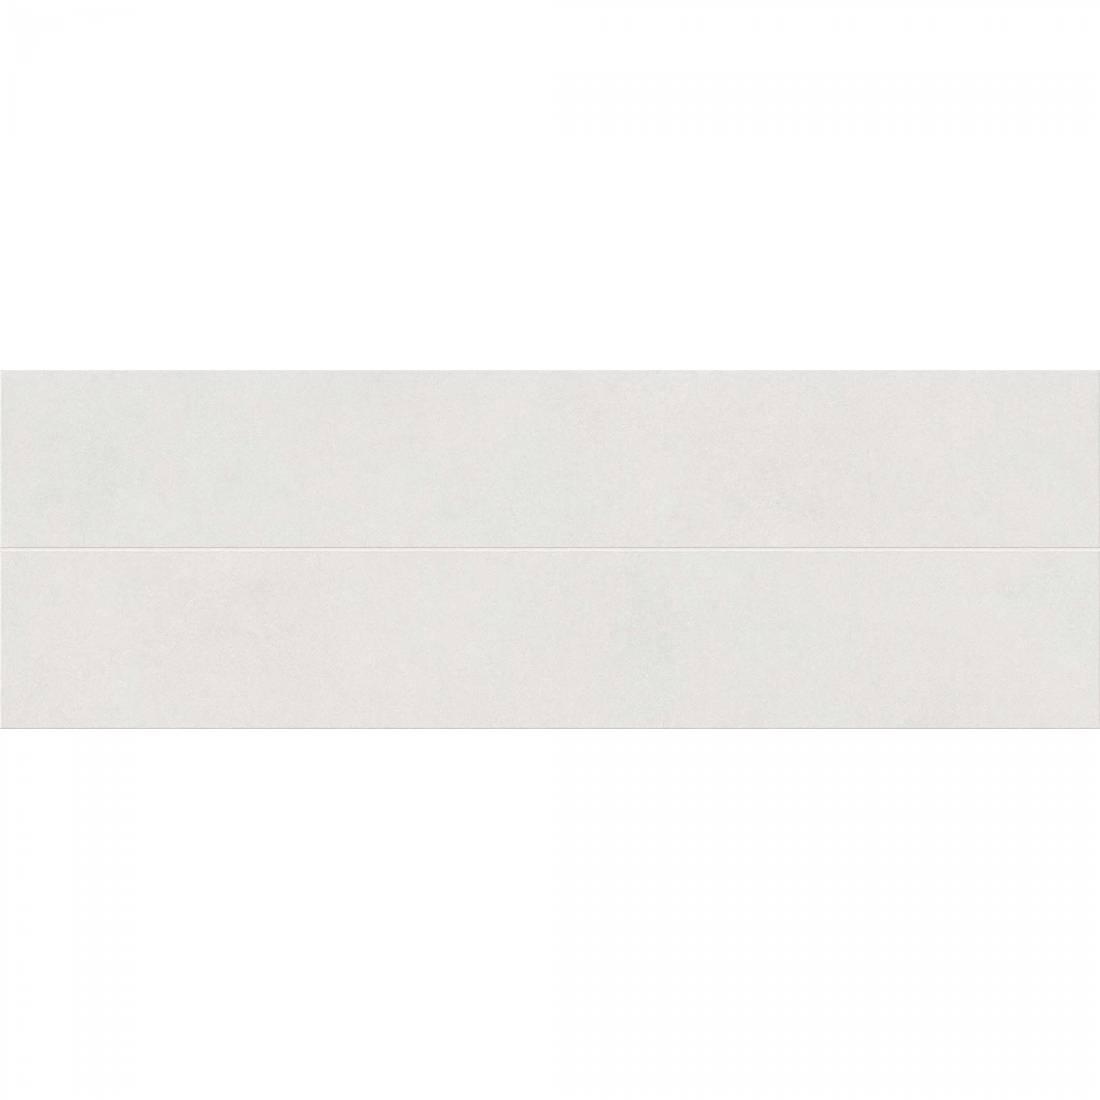 Dover 25x75 Blanco Gloss 1